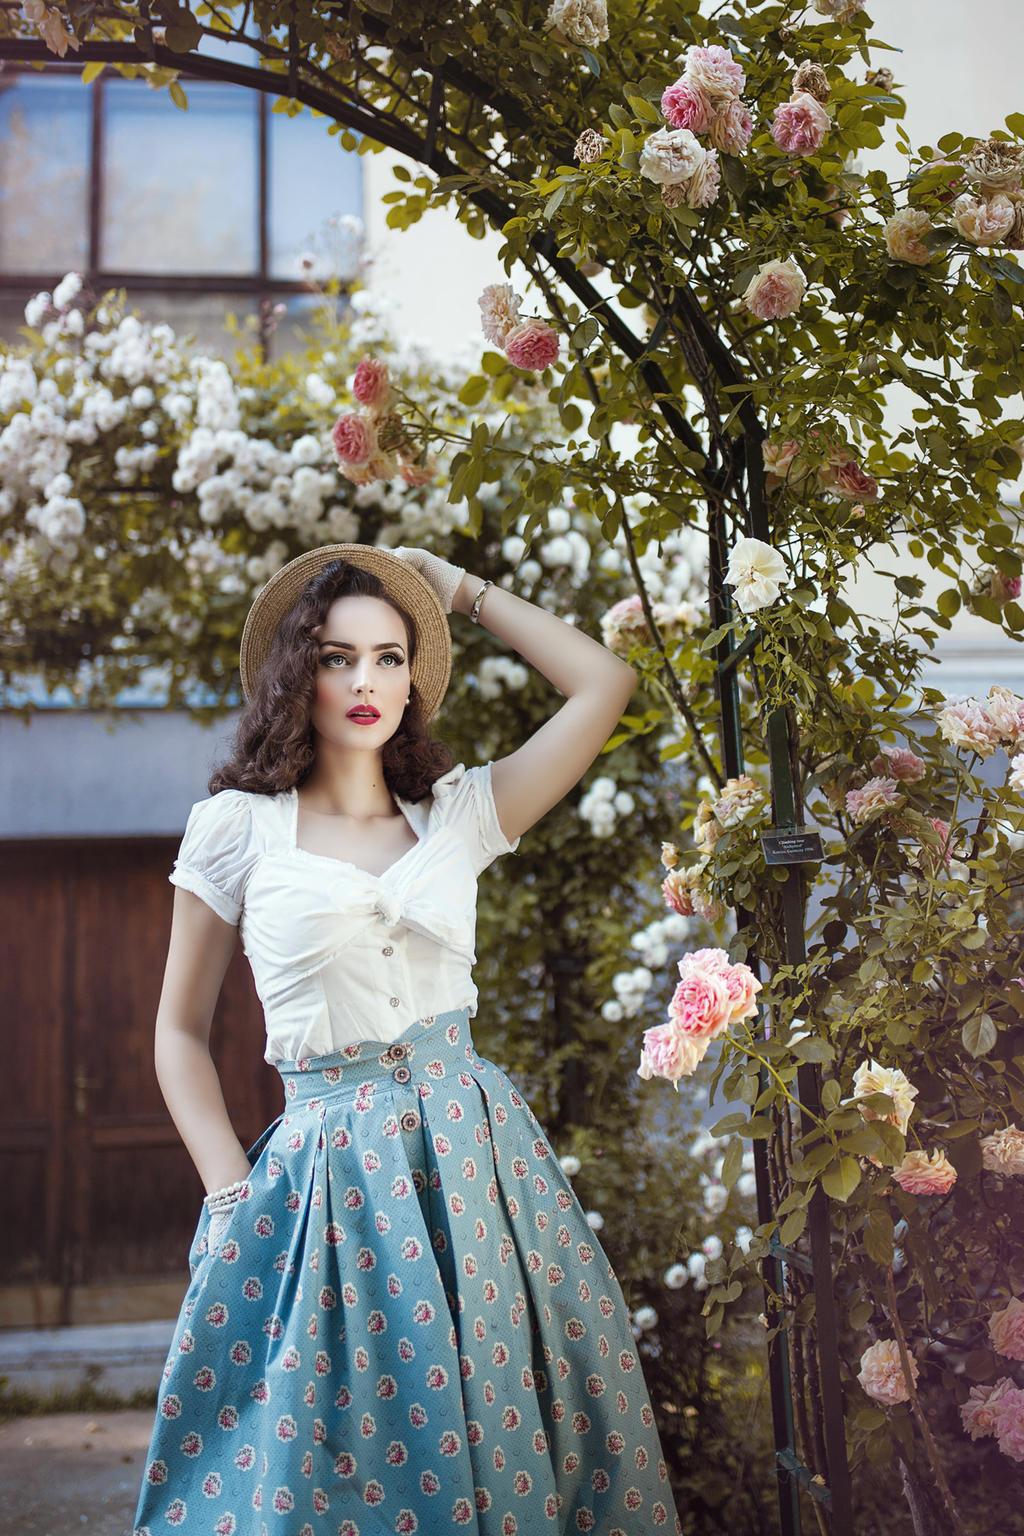 Antique Rose by DarkVenusPersephonae